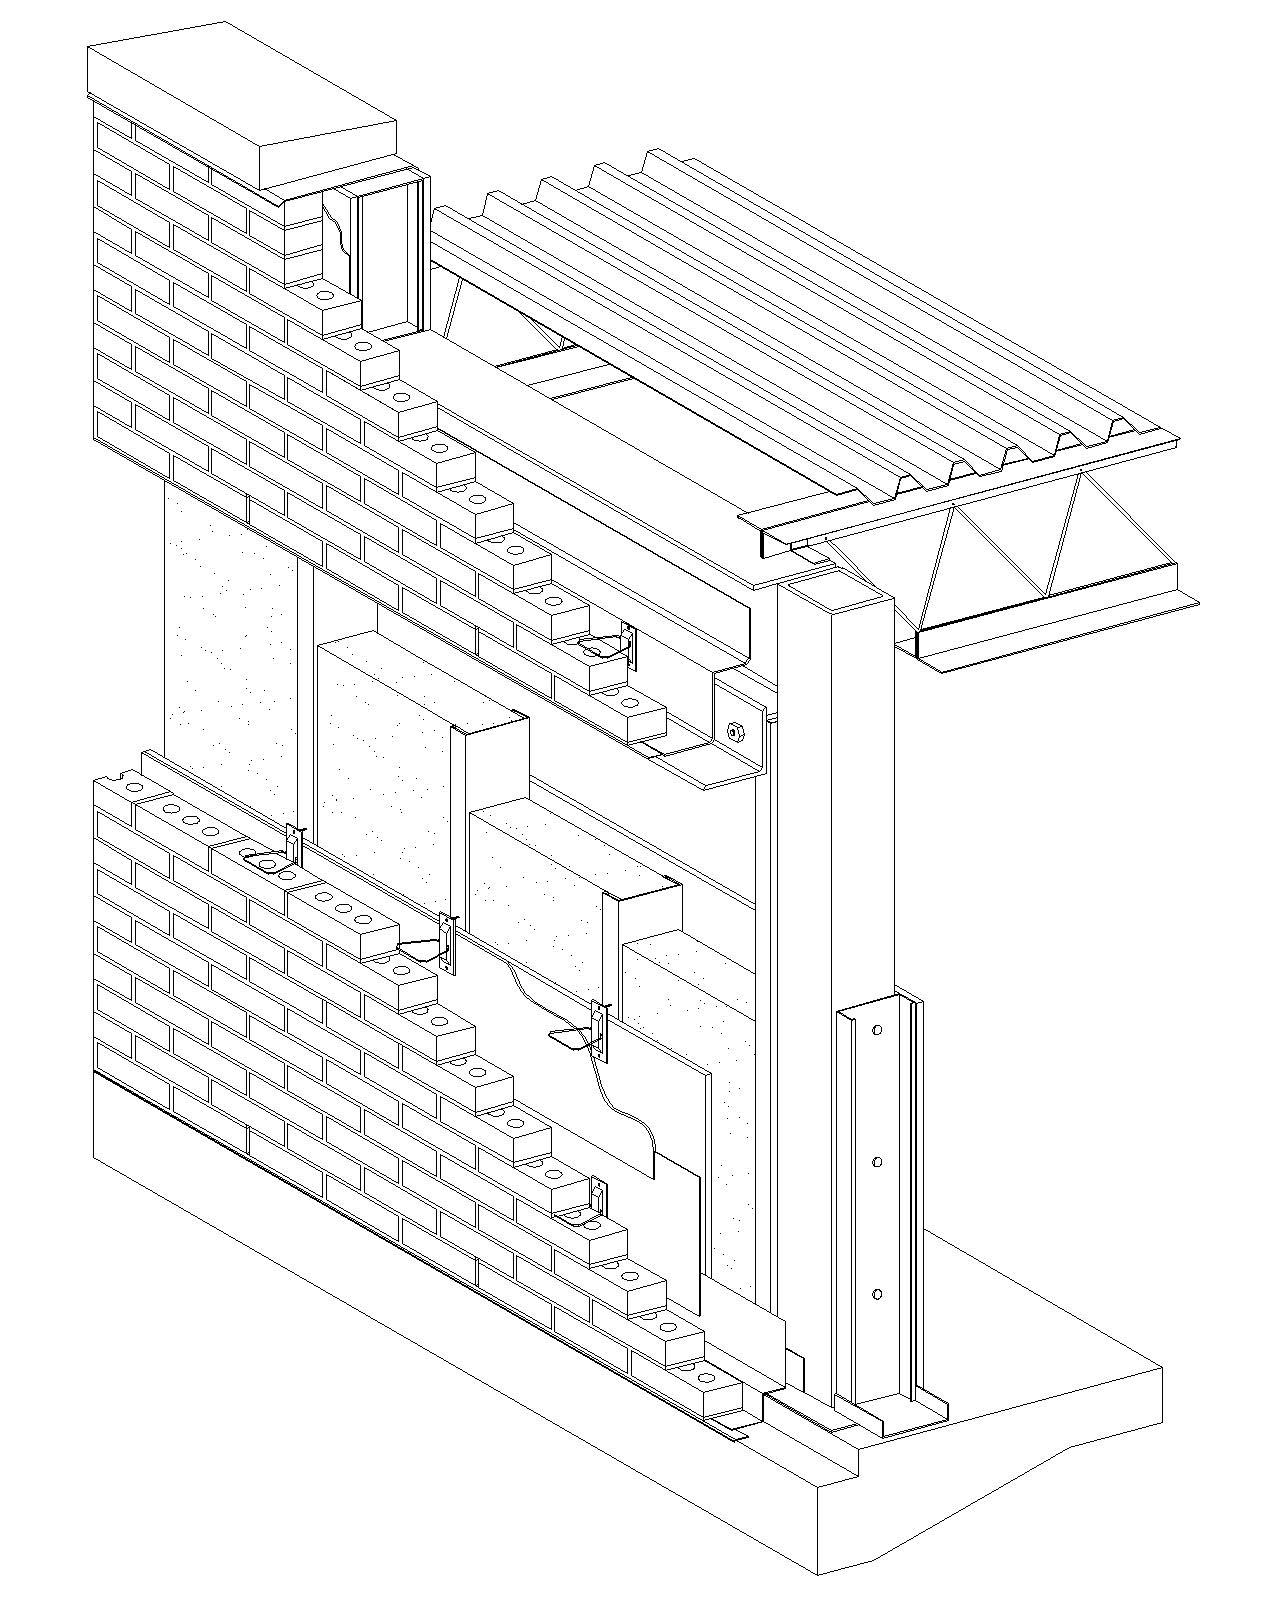 1280x1600 Cavity Wall Brick Veneersteel Stud